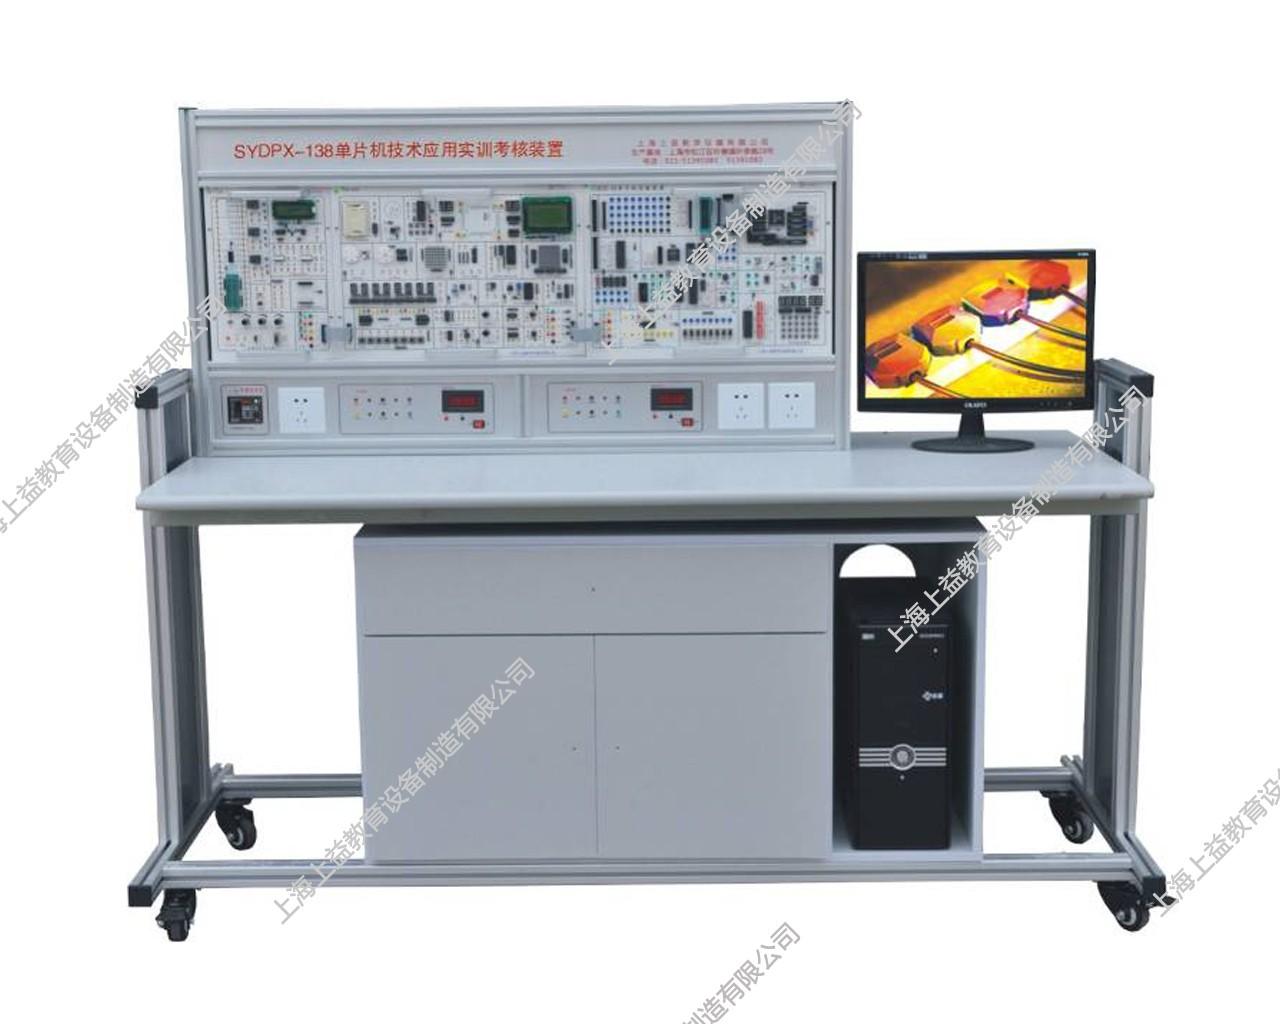 SYDPX-138单片机技术wwwlehu8viplehu68vip装置